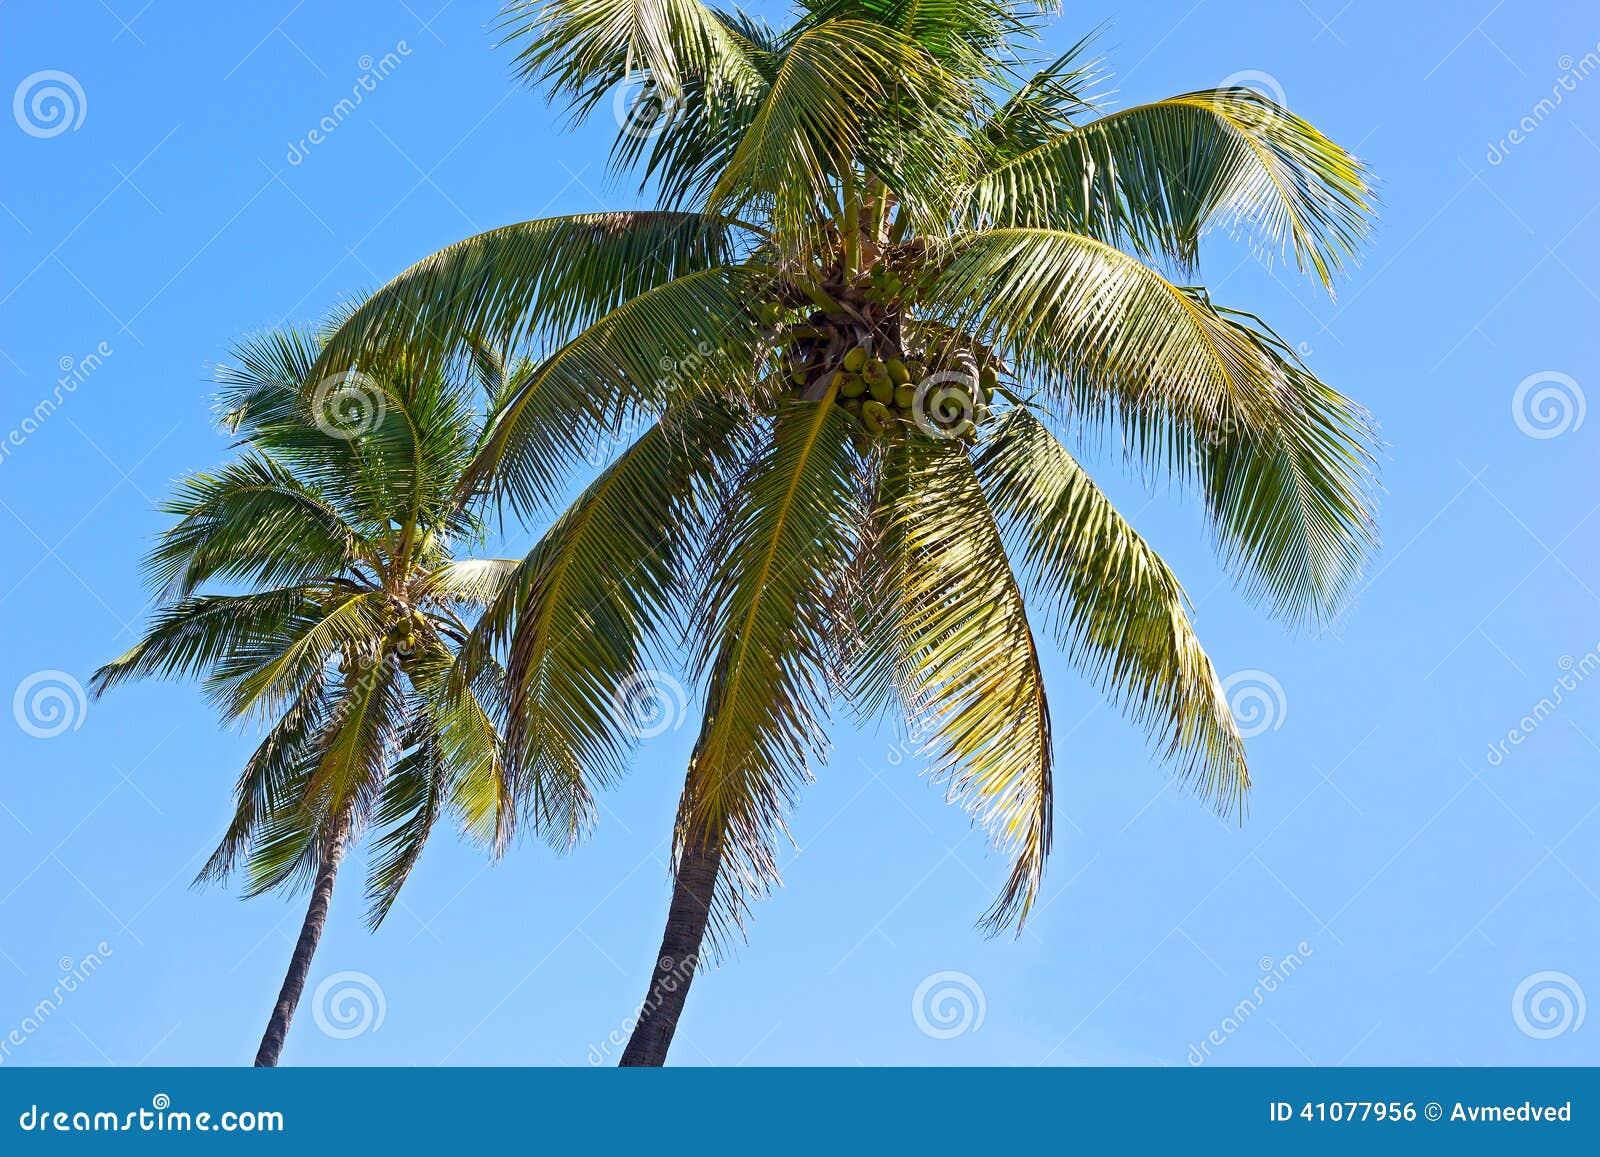 Arbres de noix de coco contre le ciel bleu de miami beach photo stock image 41077956 - Arbre noix de coco ...